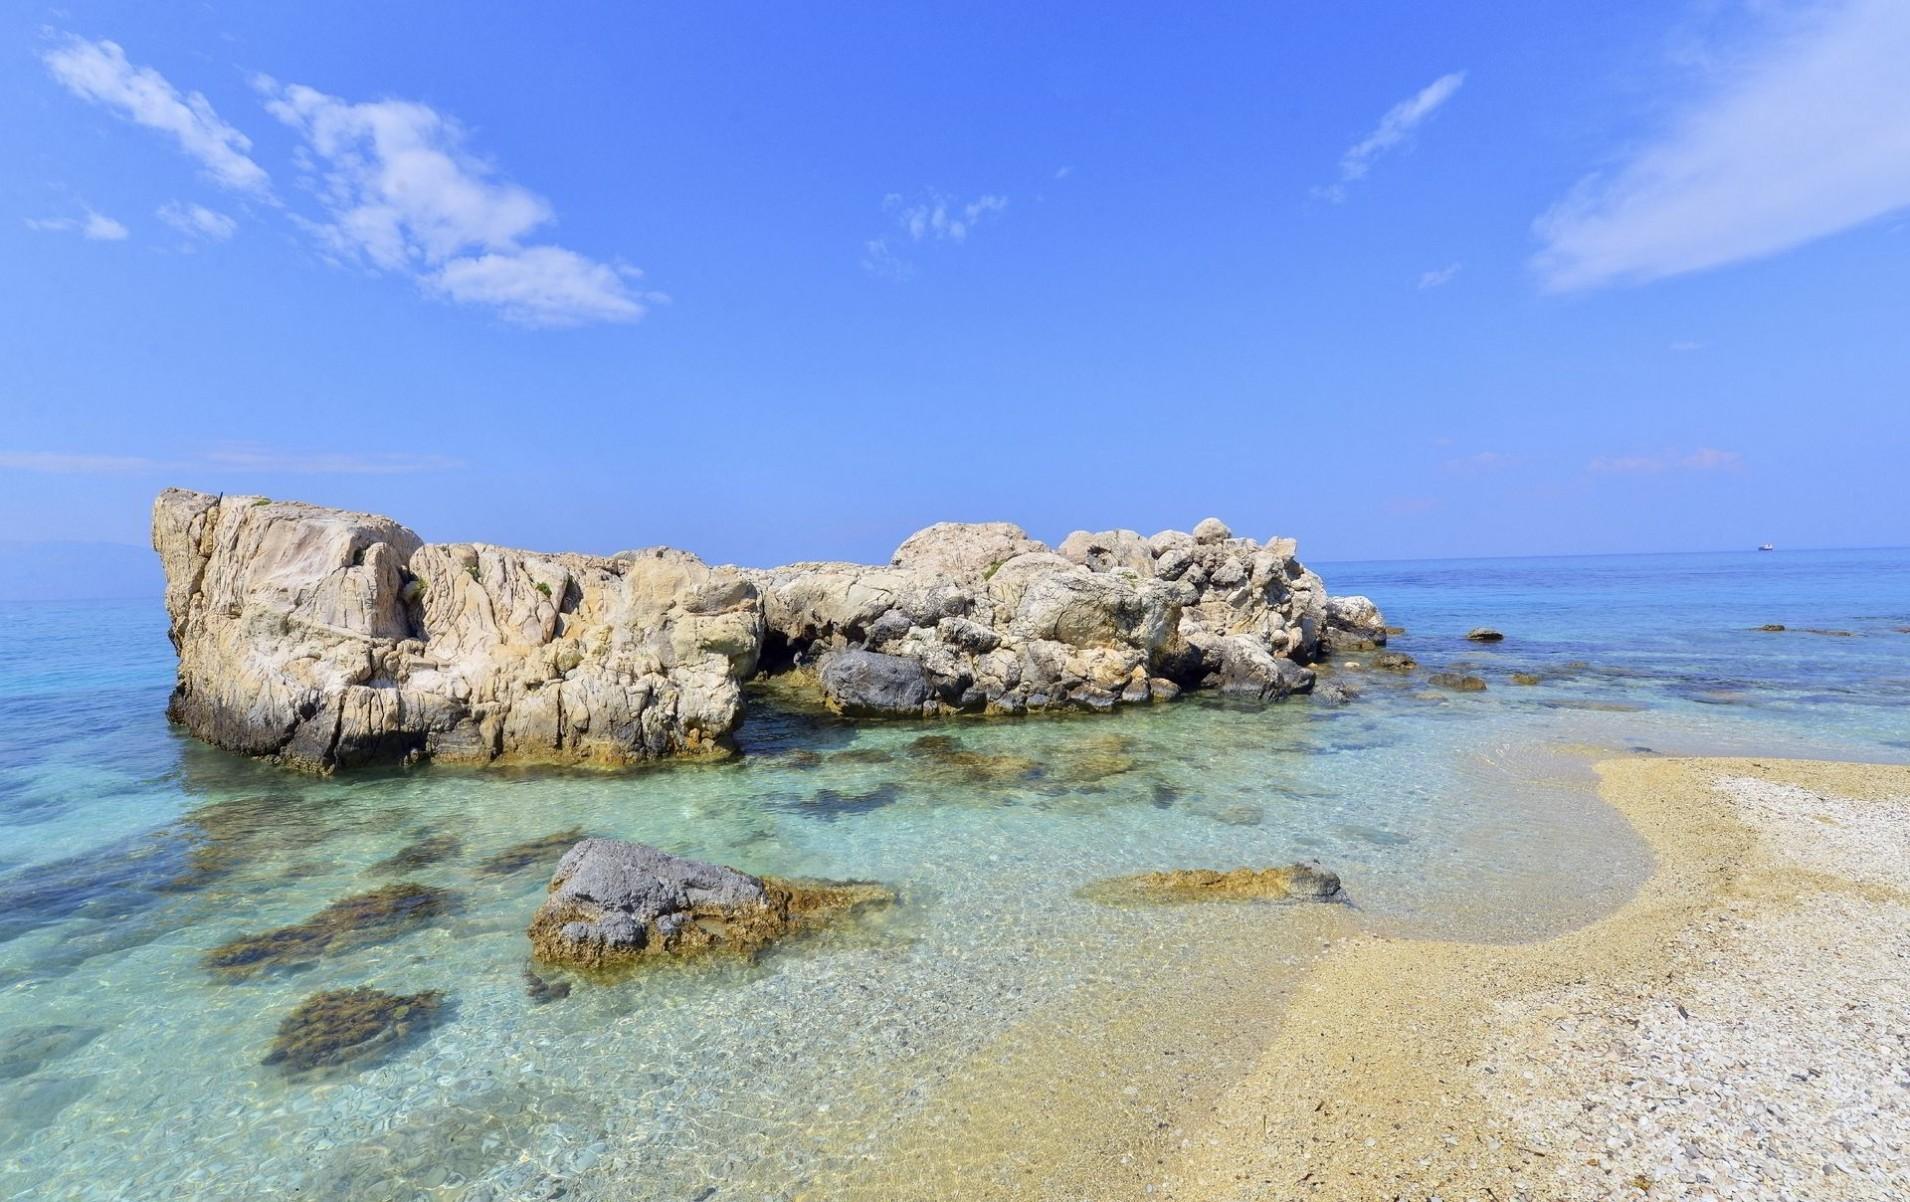 Beach-in-Antiparos-island-Cyclades